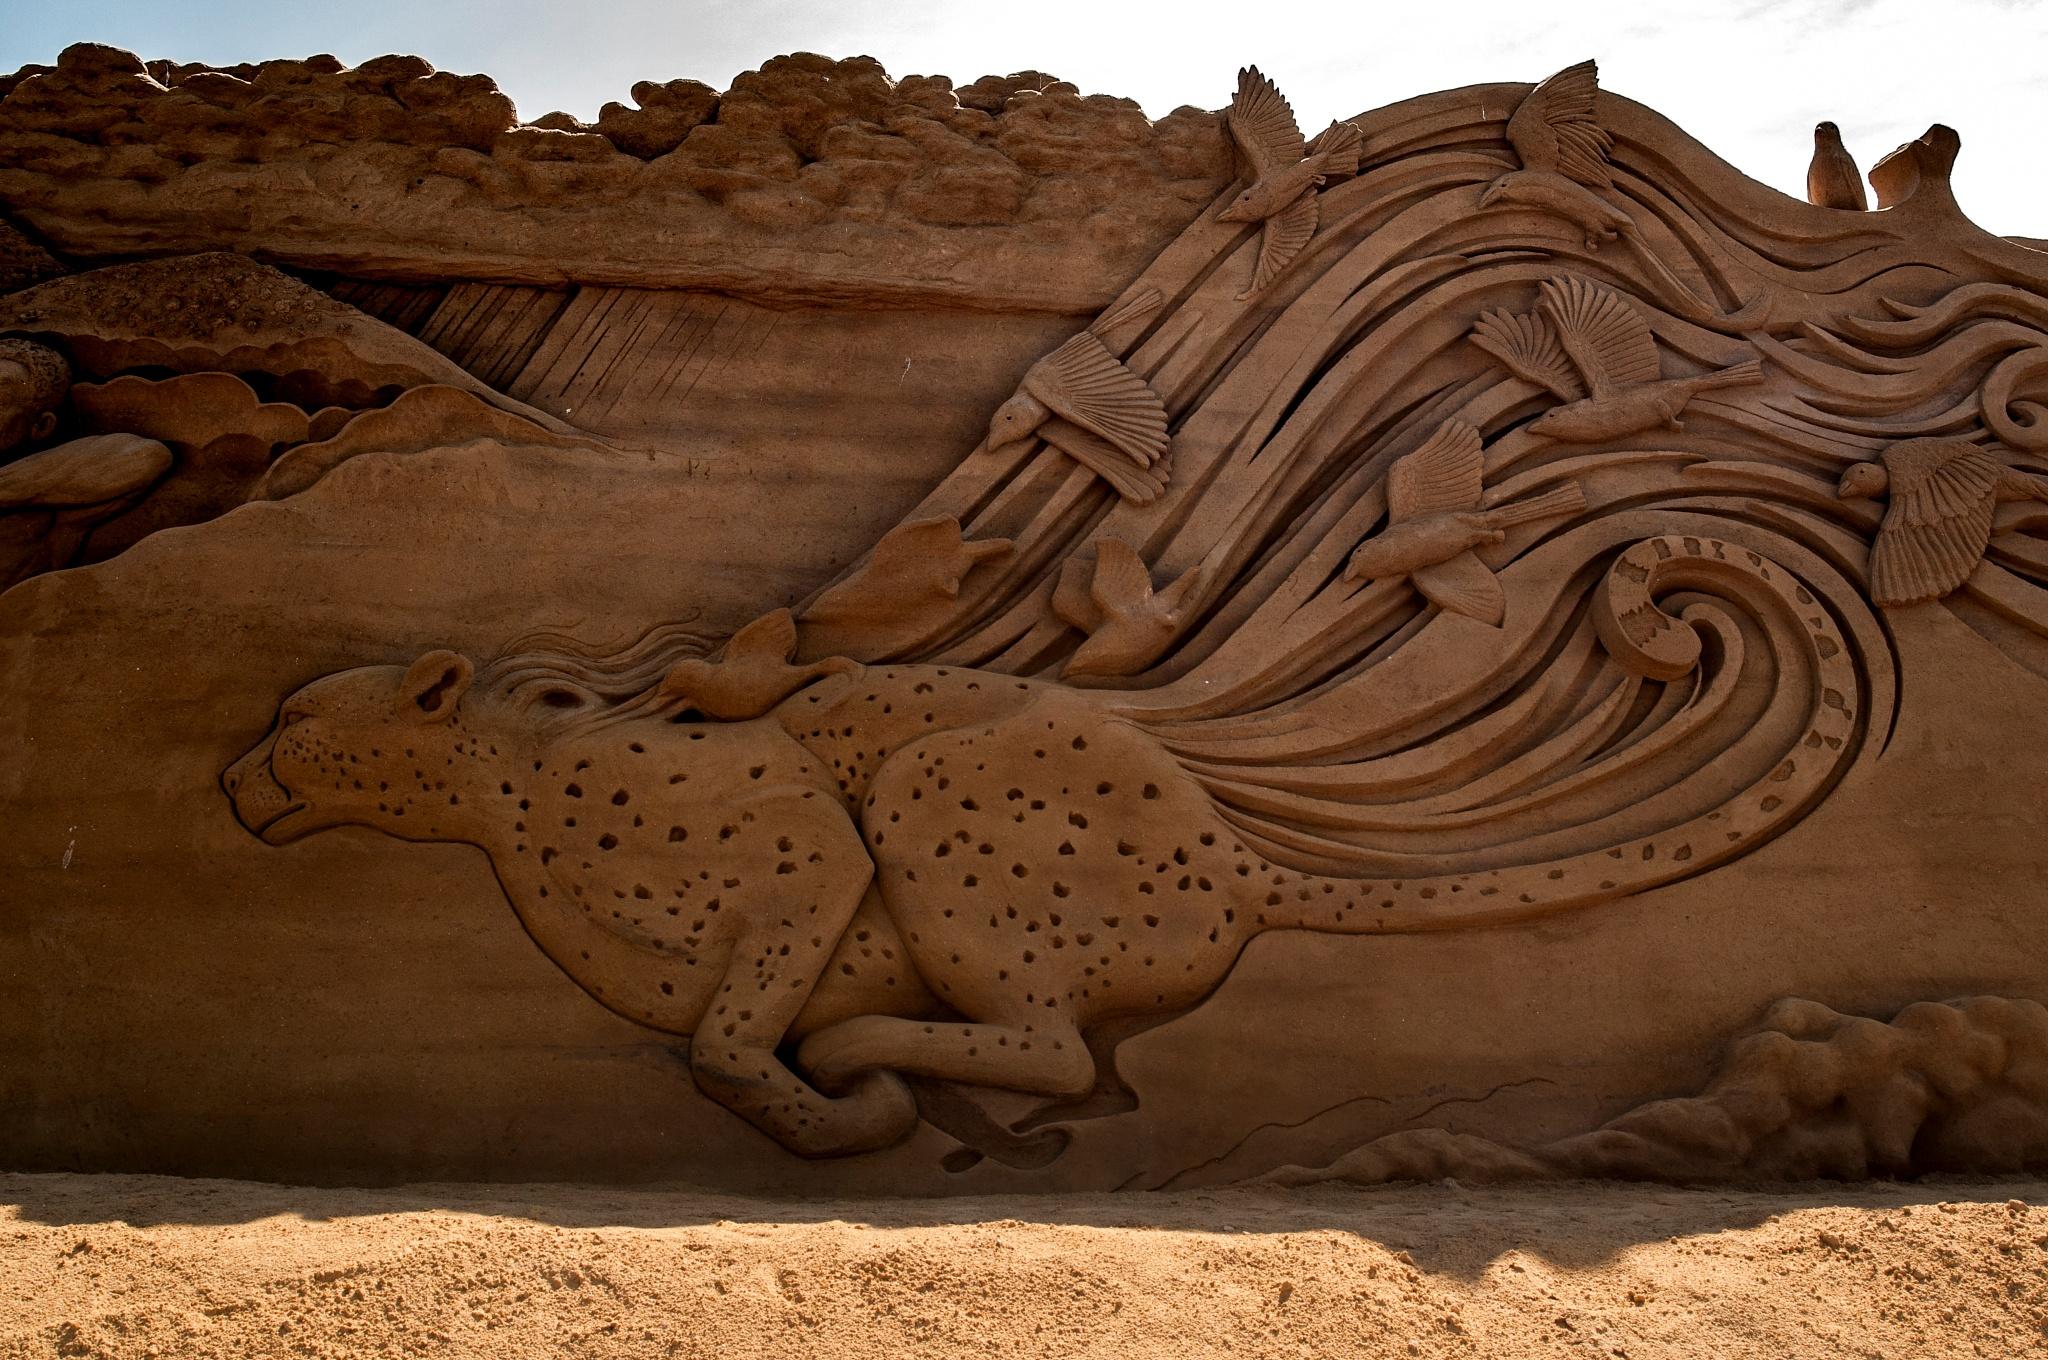 Cheetah running like the wind by Steen Skov